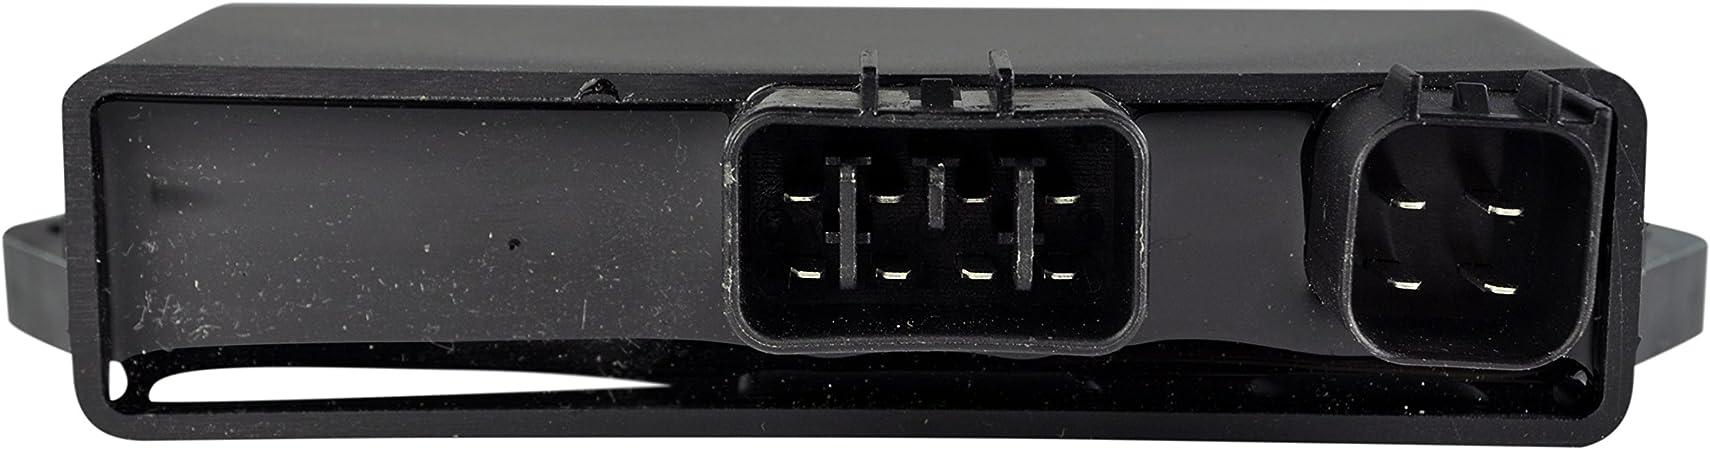 Cdi Box High Performance For Yamaha Yfm 350 Raptor Warrior 2002 2013 By Mister Electrical Auto